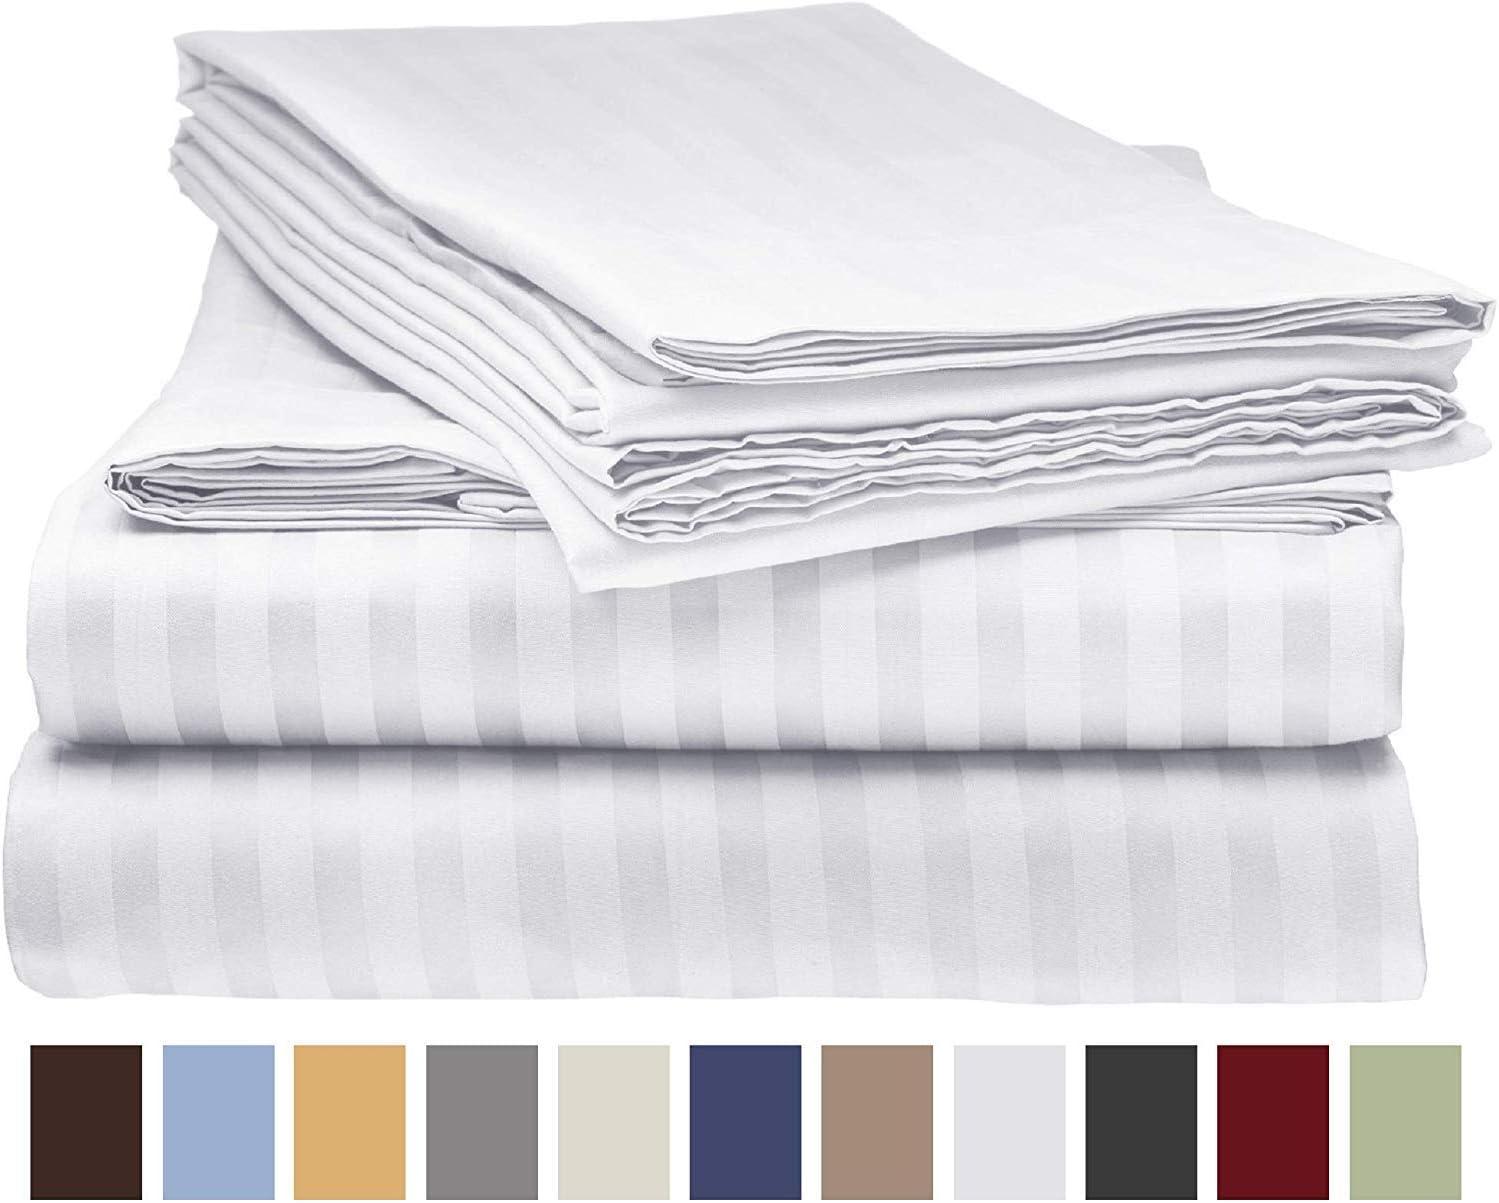 5-Piece 800-Thread-Count 100% Cotton Sheet White Stripe Split King-Sheets Set, Long-Staple Cotton Best-Bedding Sheets for Bed, Soft & Silky Sateen Weave Fits Mattress Upto 12'' Deep Pocket